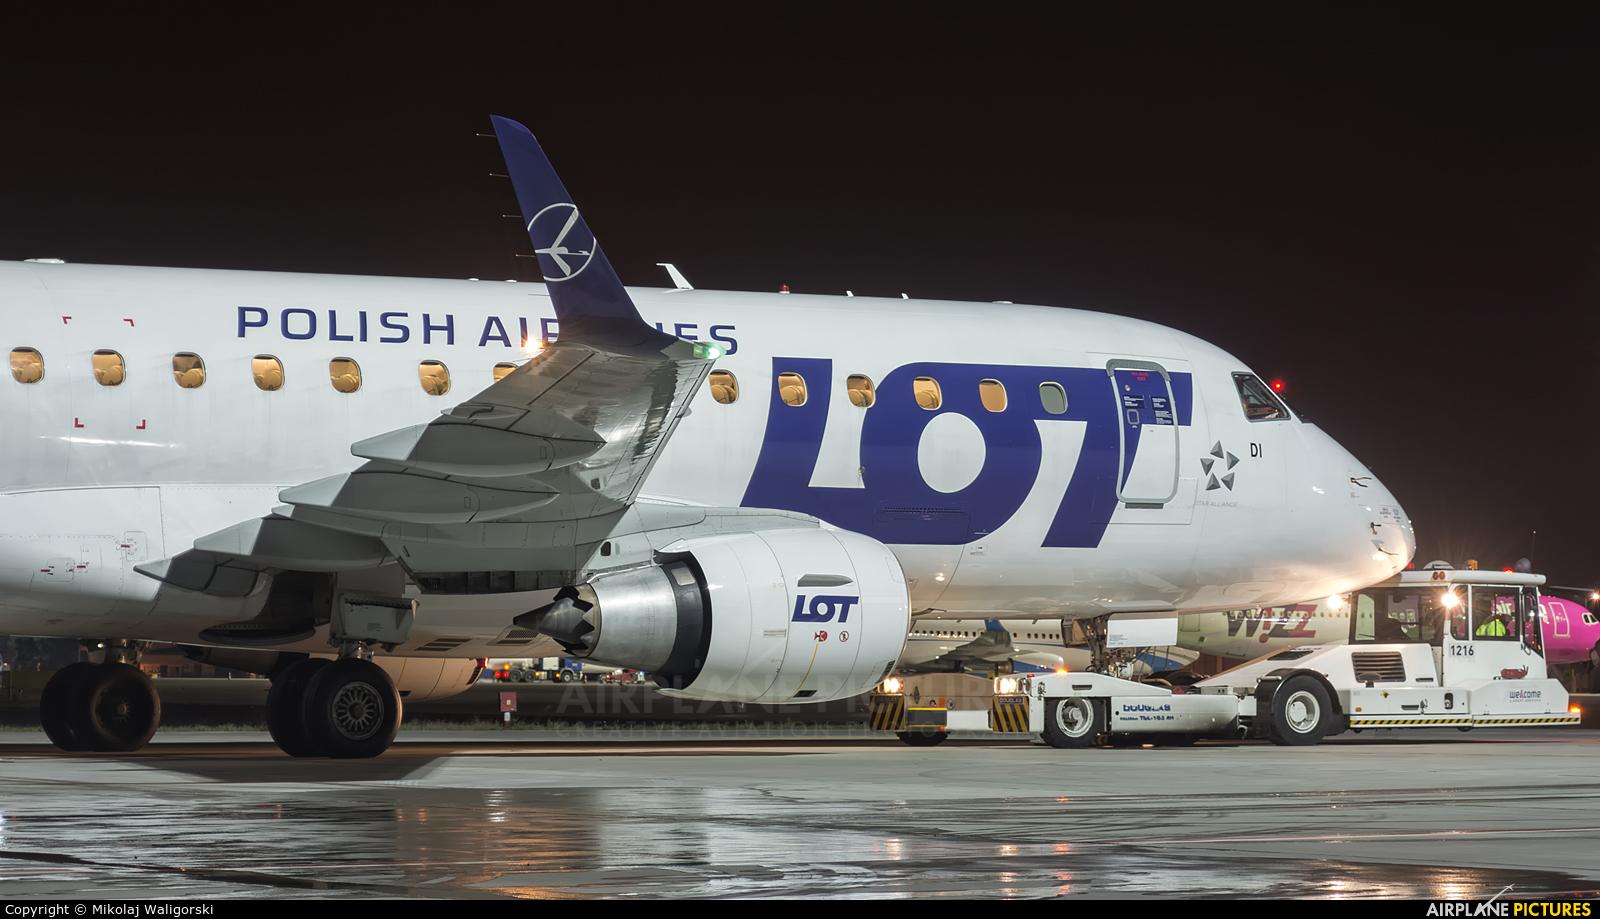 LOT - Polish Airlines SP-LDI aircraft at Poznań - Ławica